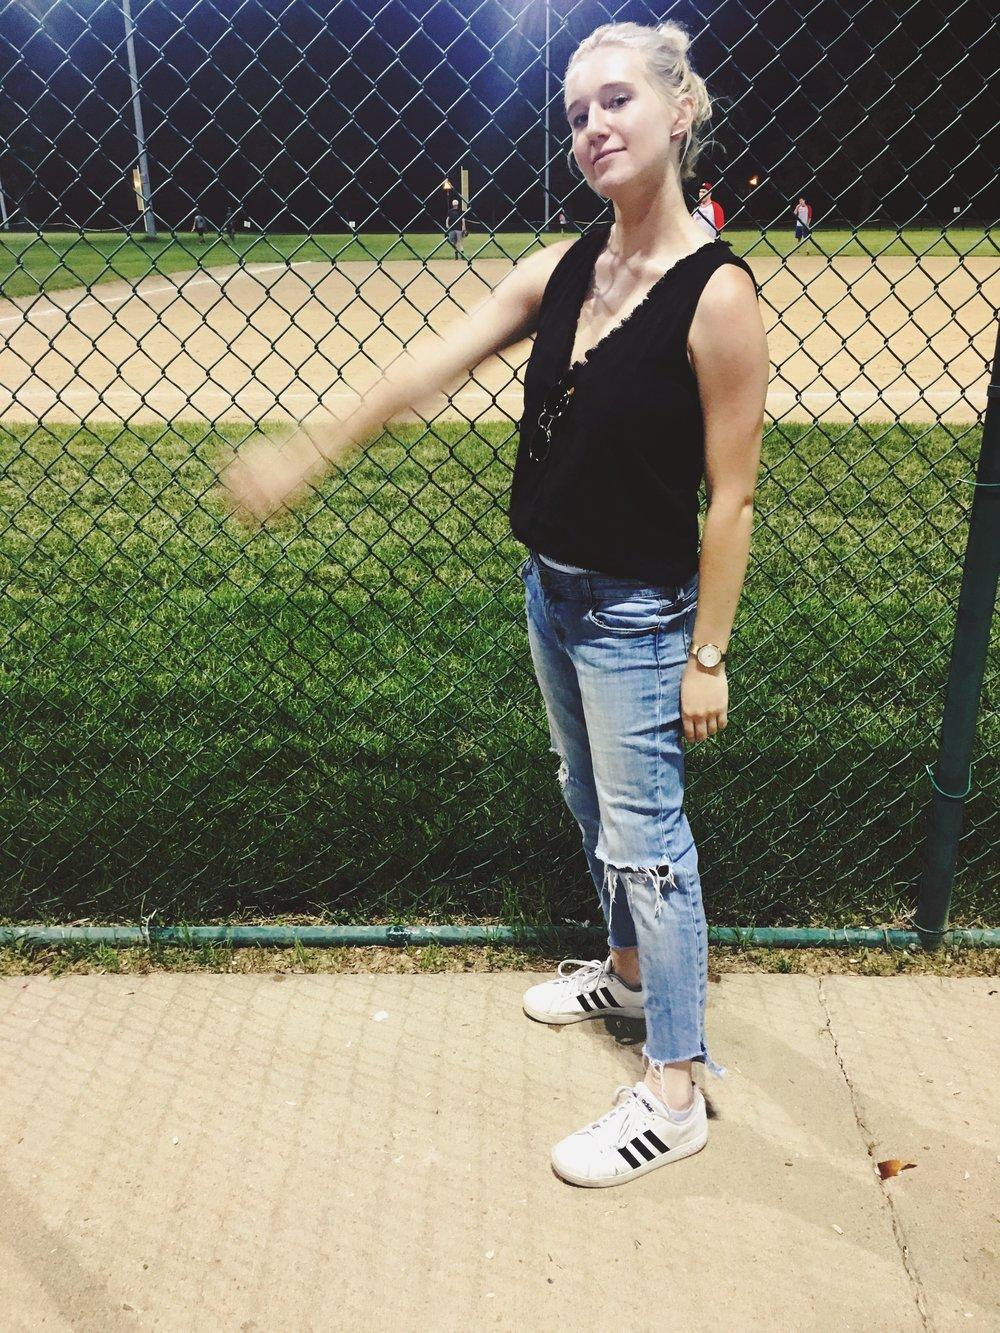 #athlete #softball #sportz #youcansortofseemyunderwear